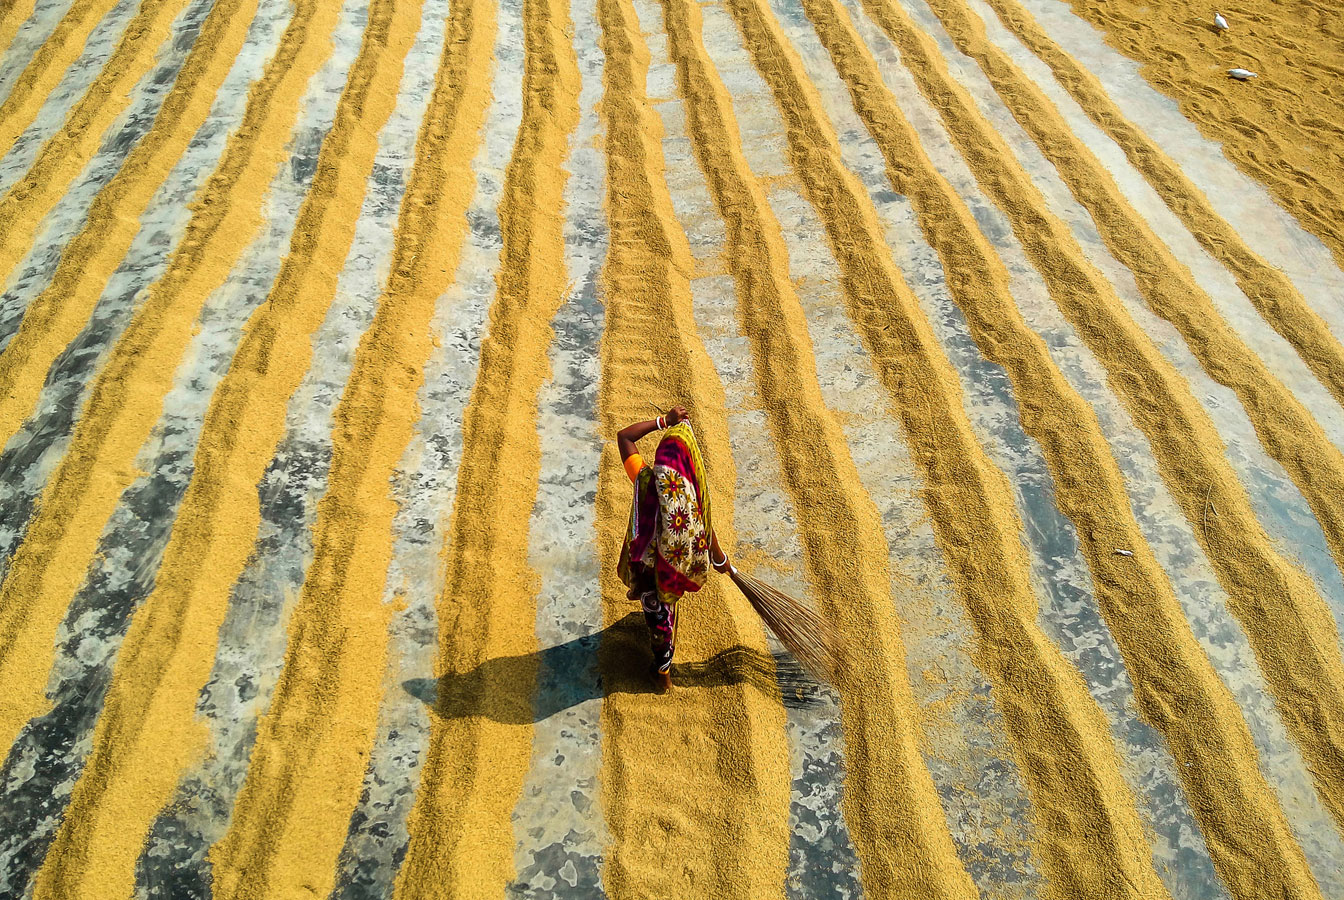 The broom, © Ehsanul Siddiq Aranya, Bangladesh, 1 place in nomination Mobile photography, 35AWARDS Photo Contest